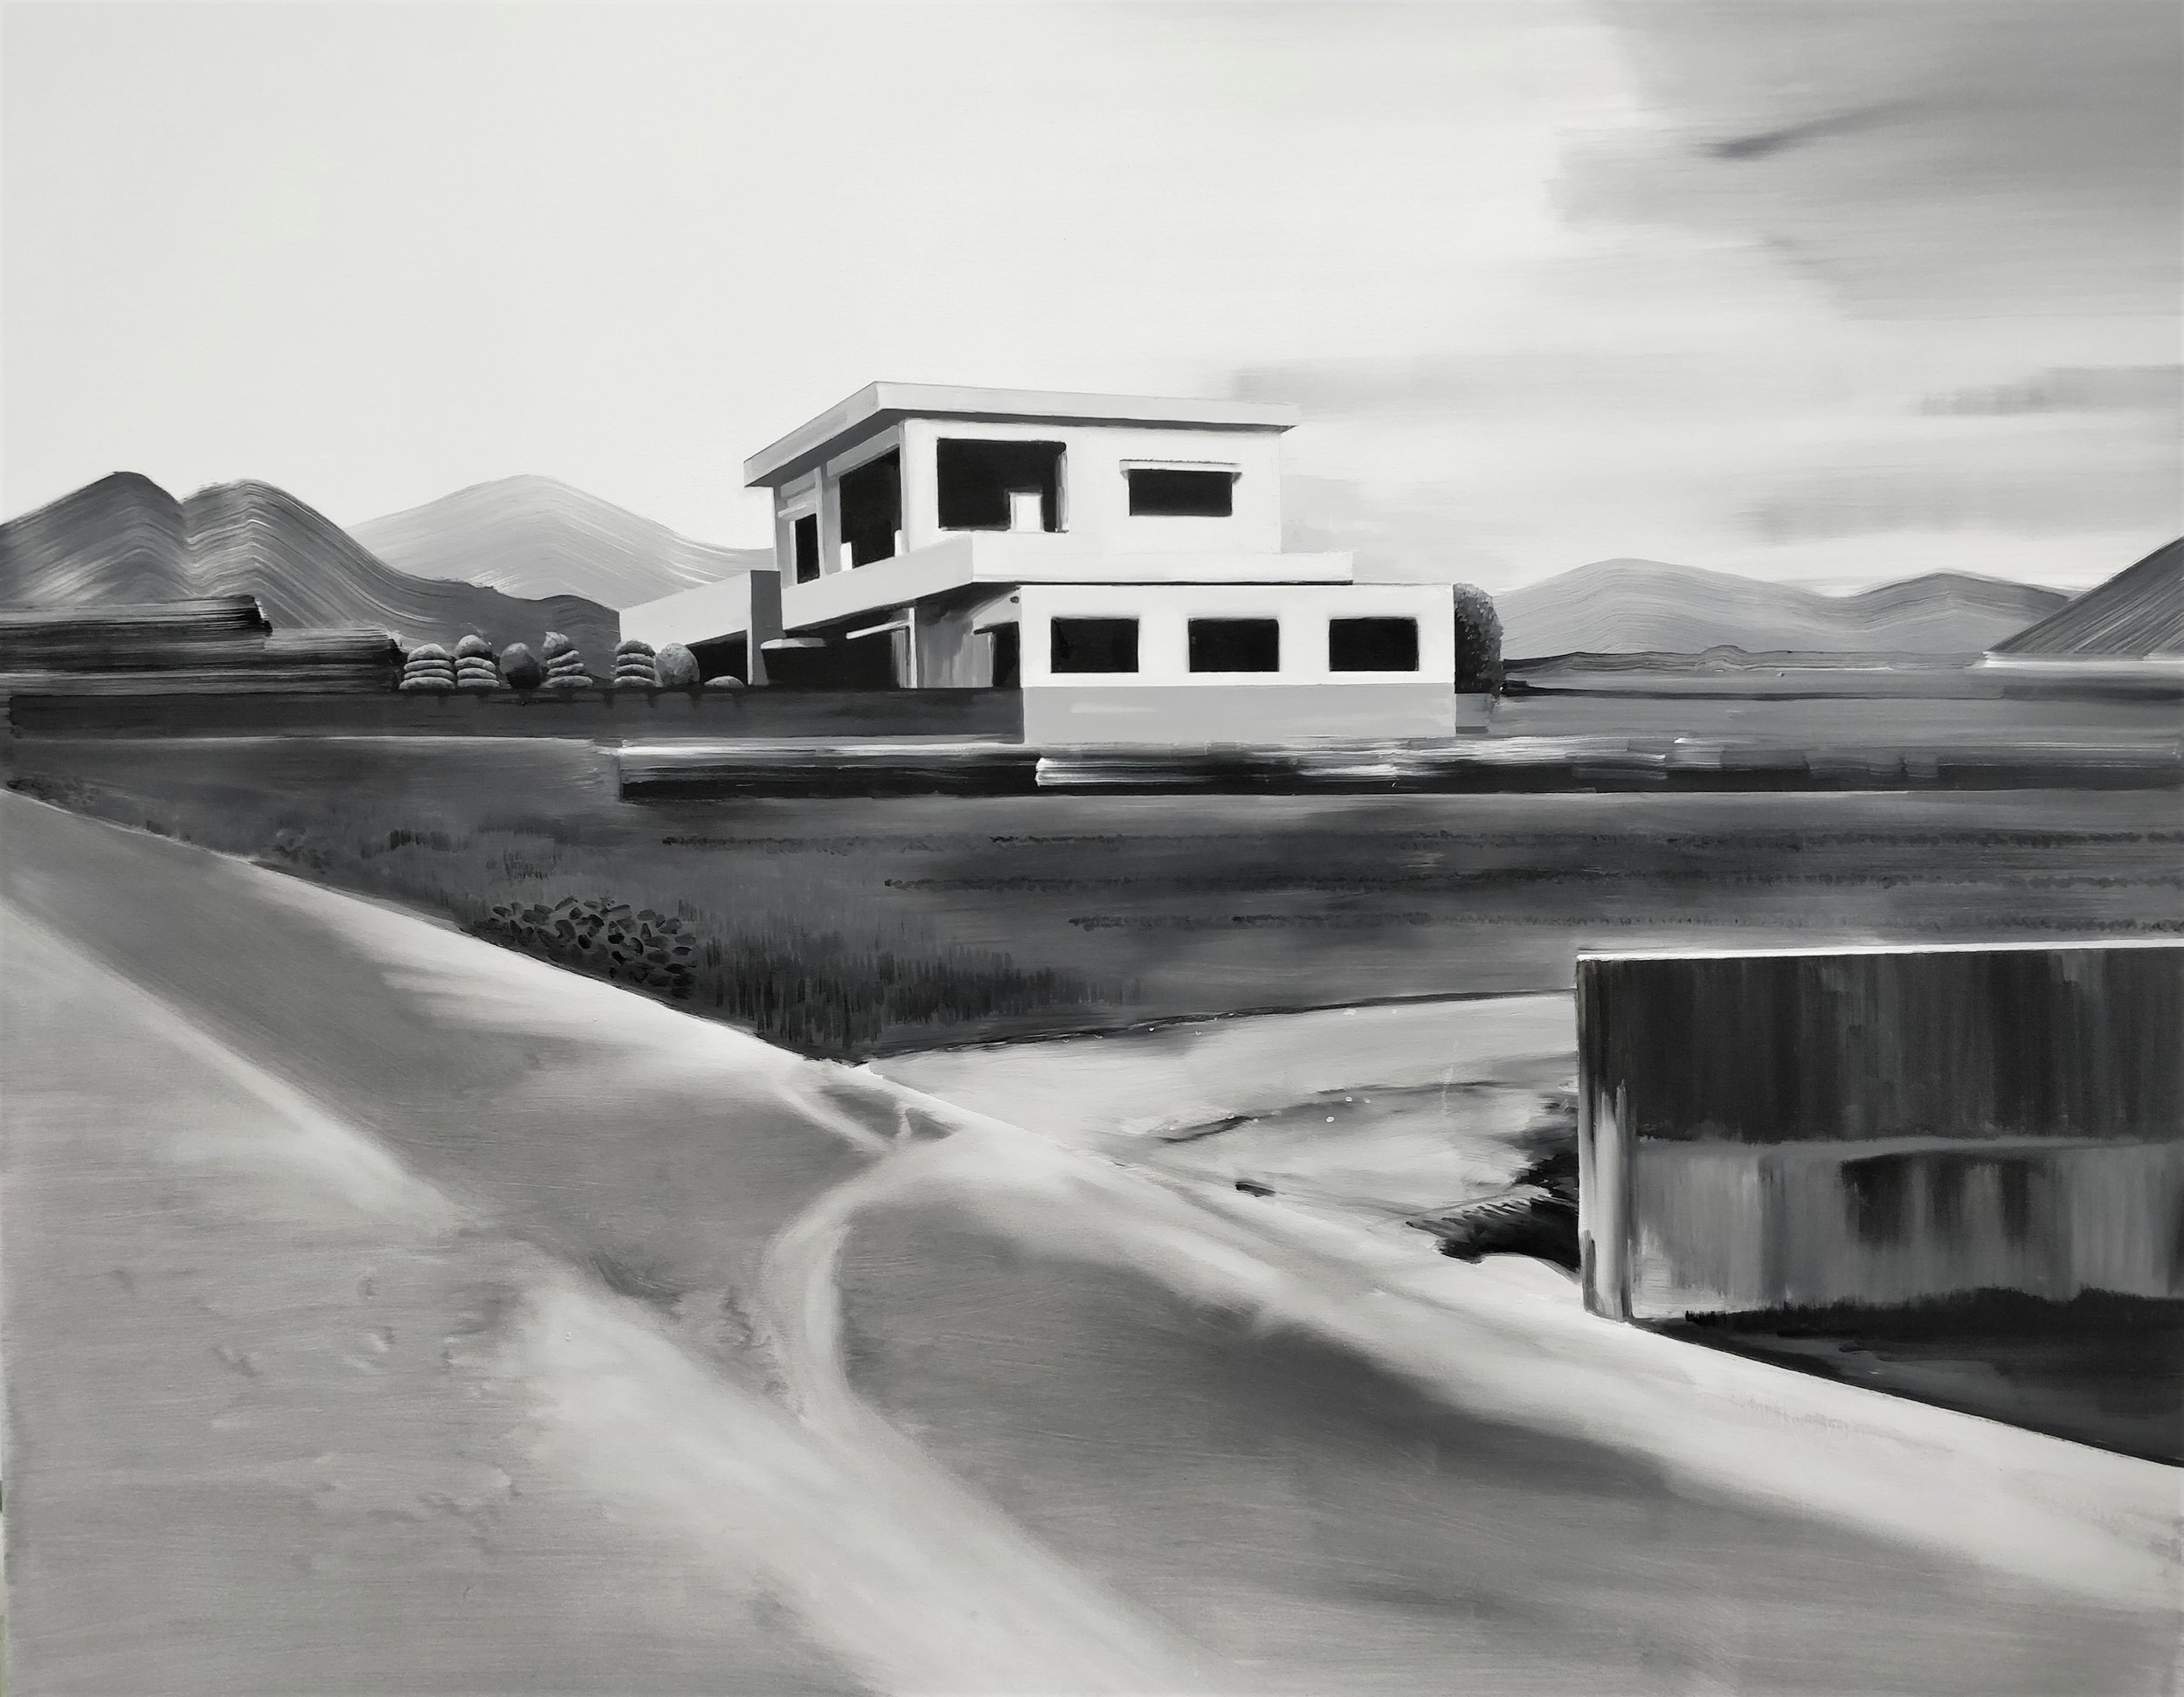 Charlotte Brisland, White and Grey House, oil on canvas, 150x120cm,  http://www.charlottebrisland.com